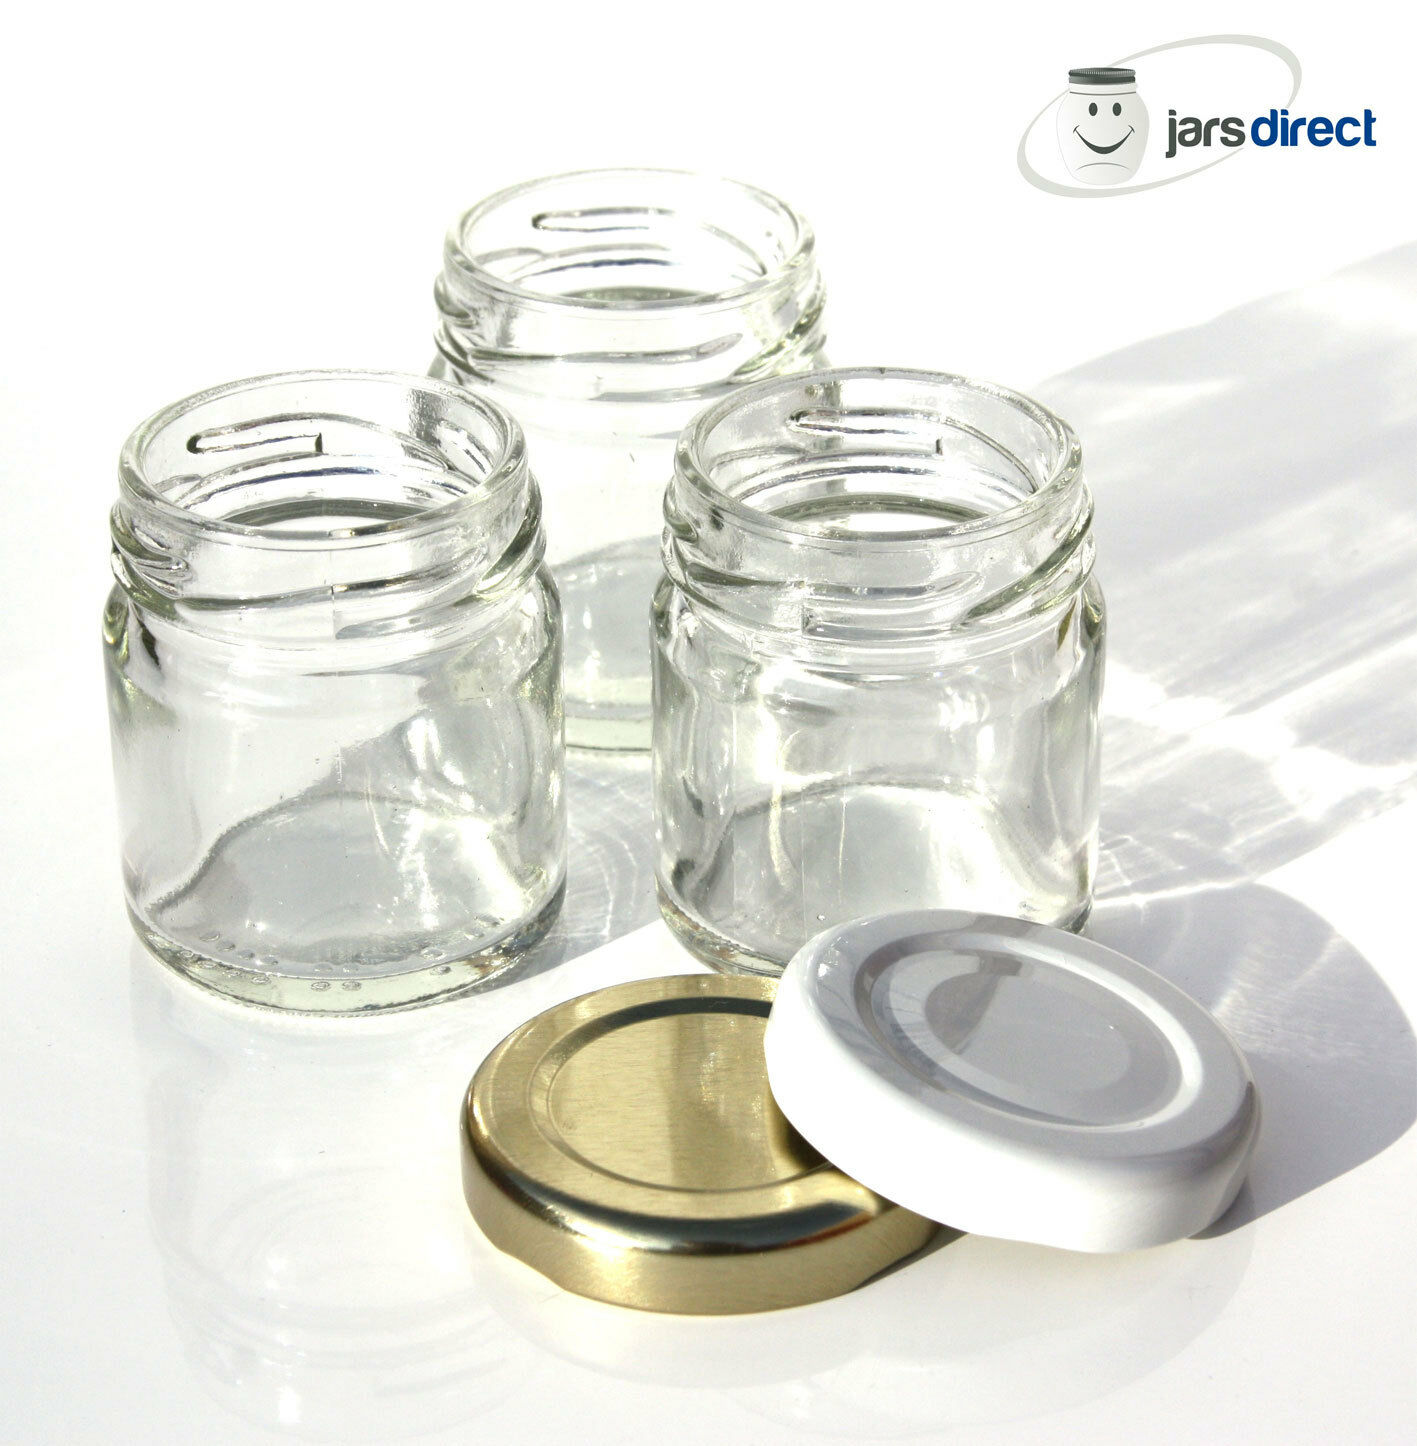 50 x 1.5oz (43ml) GLASS MINI JARS - SUITABLE FOR SMALL WEDDING ...